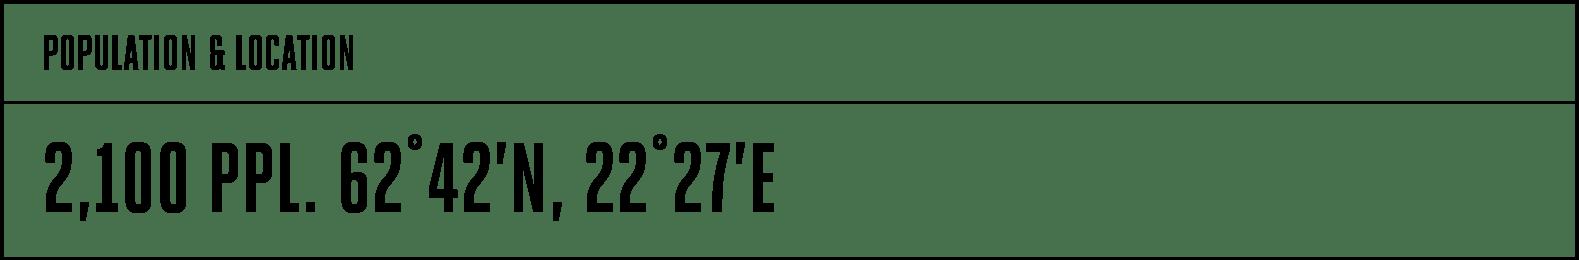 Koskenkorva population location information box